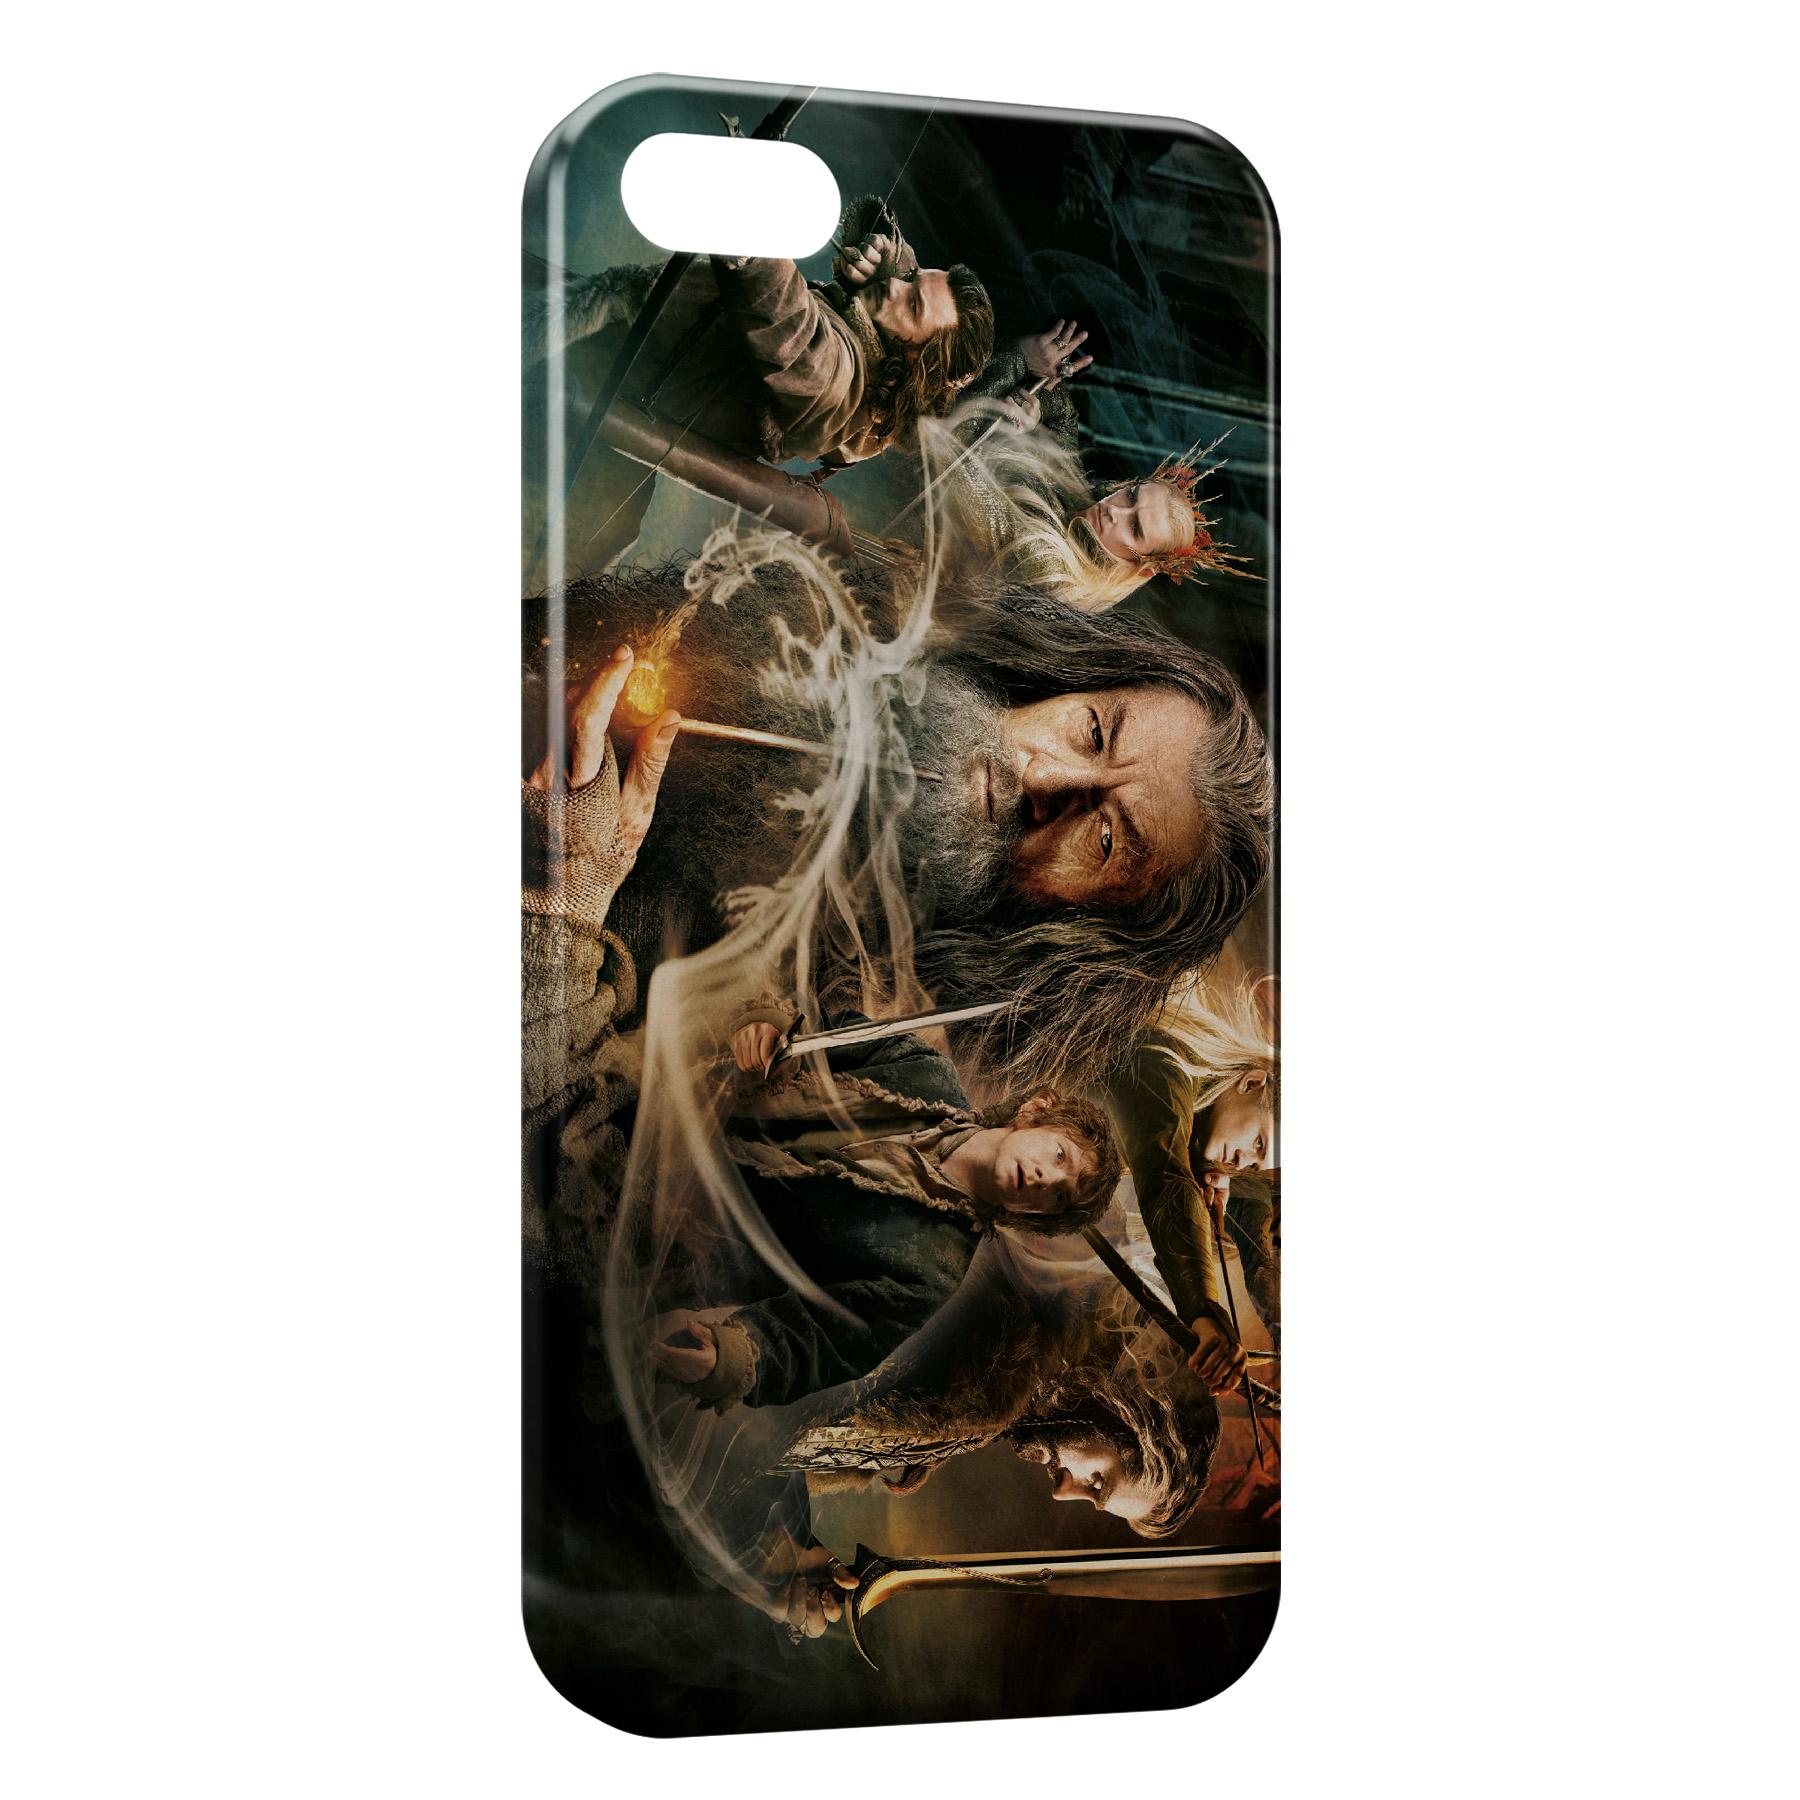 Coque iPhone 5/5S/SE The Hobbit